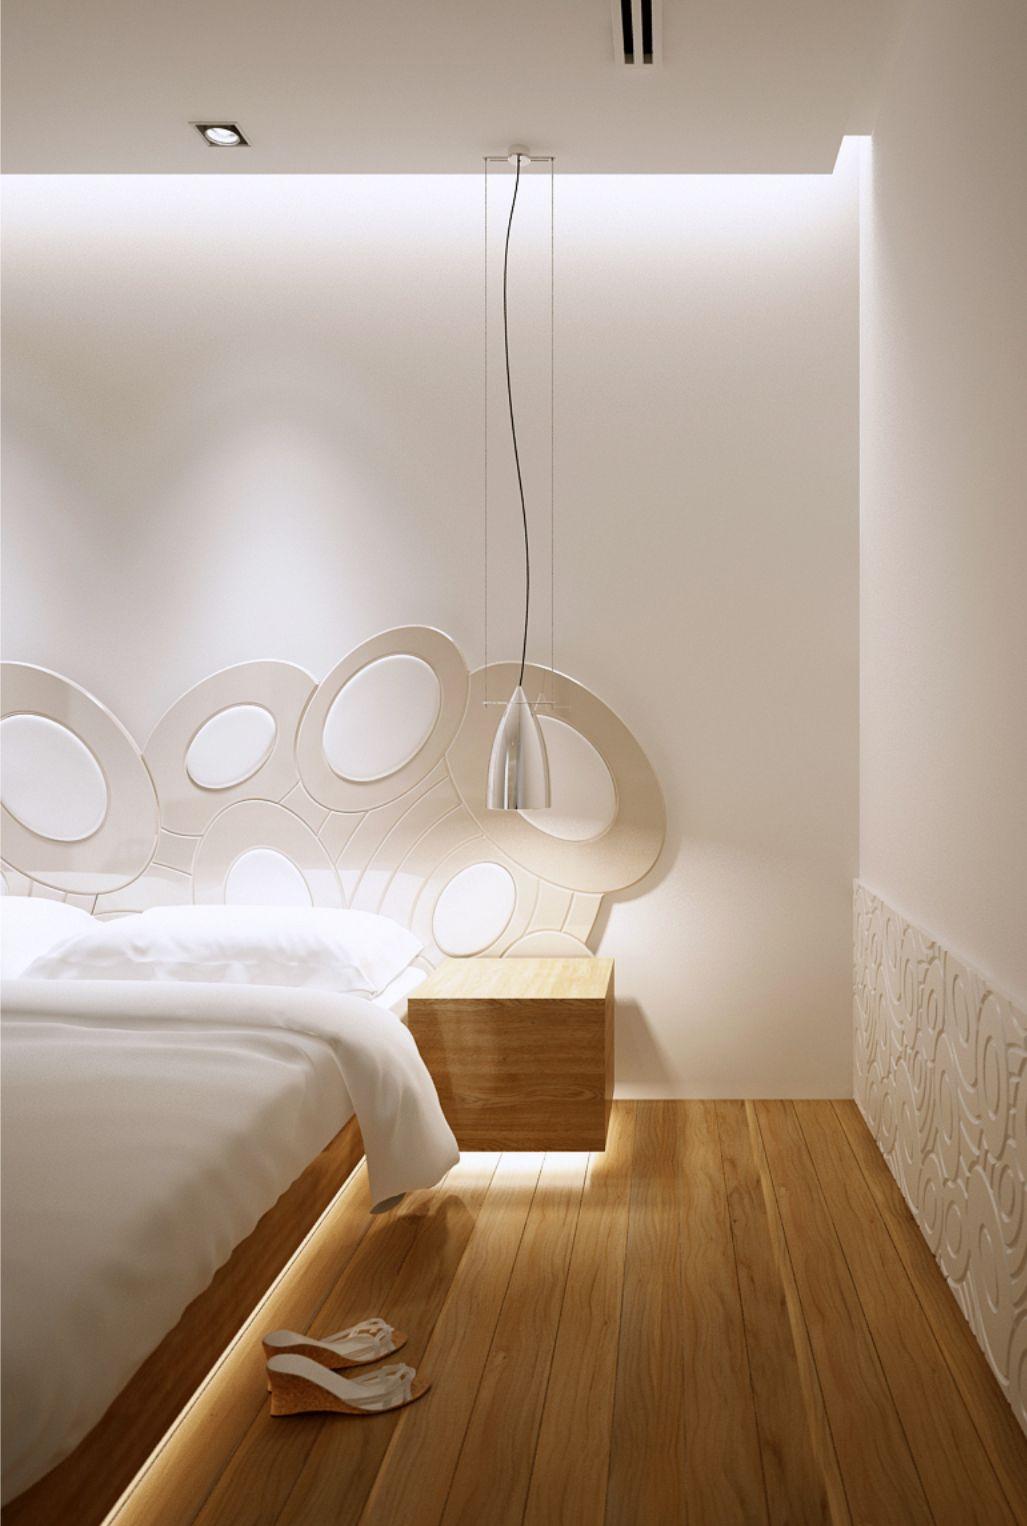 poza ambient dormitor pat cu tablie din mdf vopsit alb decupaje forma ovalizata